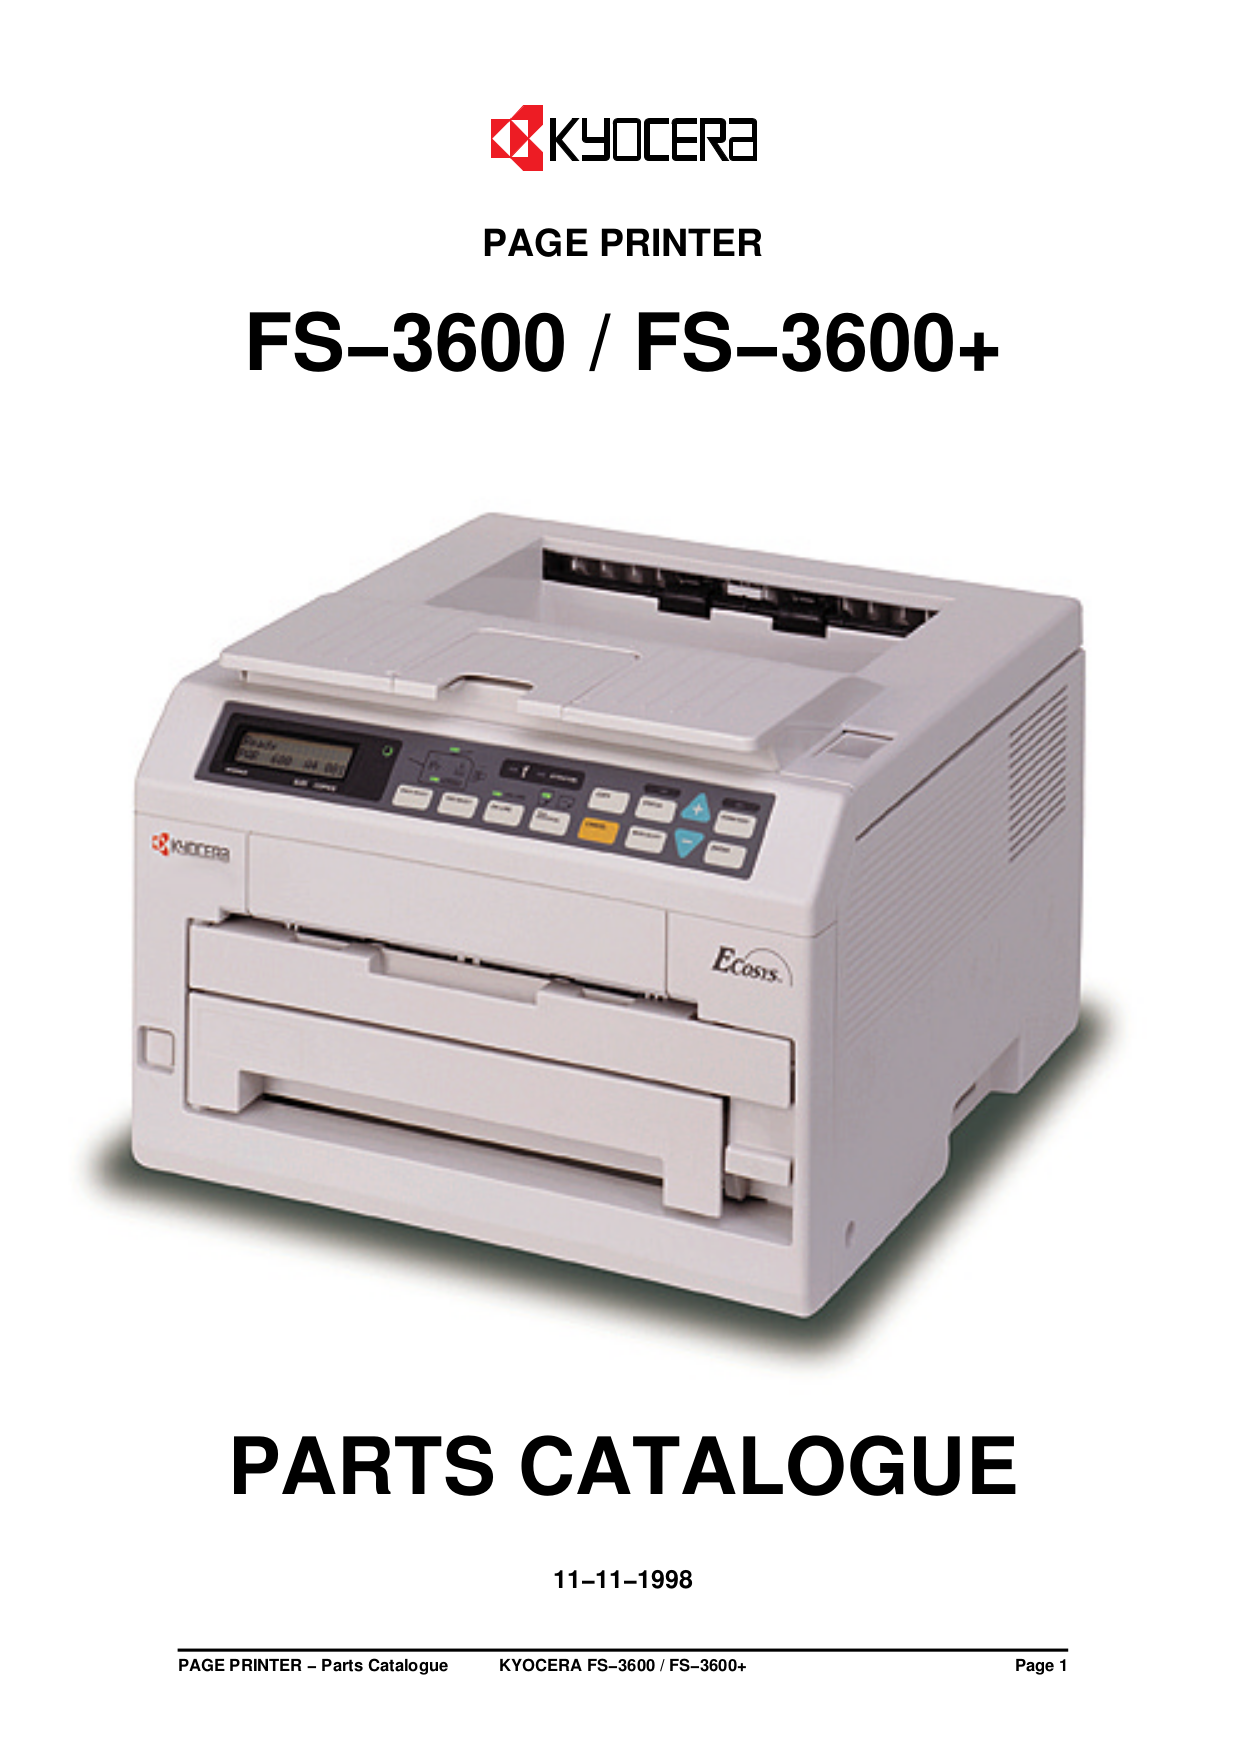 kyocera fs 1016mfp multifunction printer service repair manual parts list service bulletin